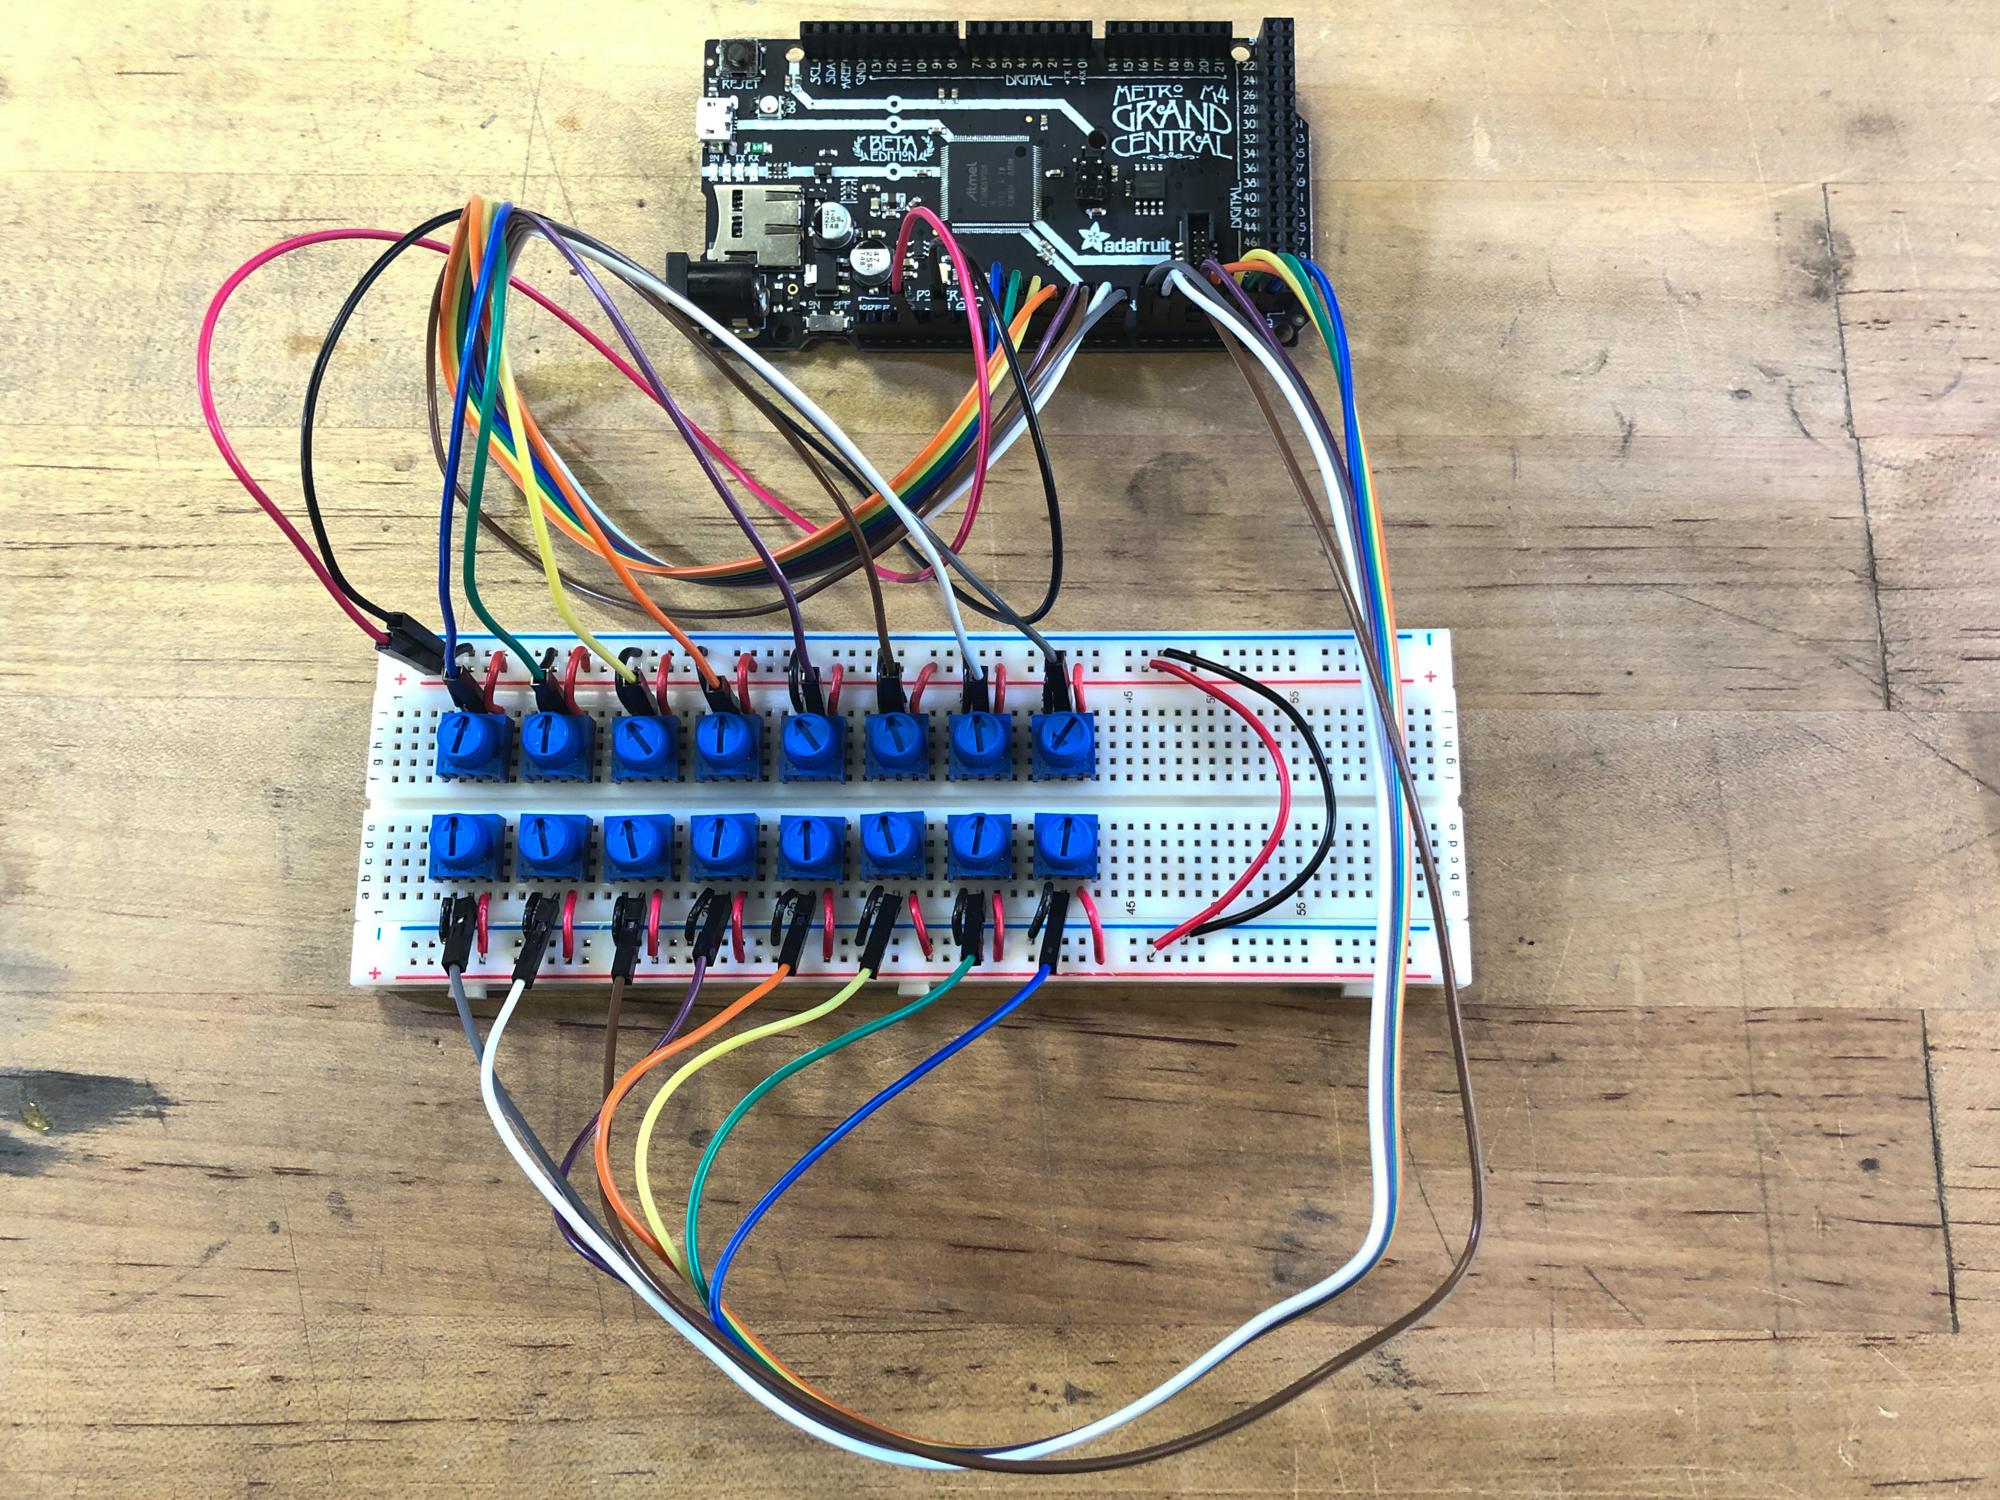 micropython___circuitpython_IMG_3571_2k.jpg